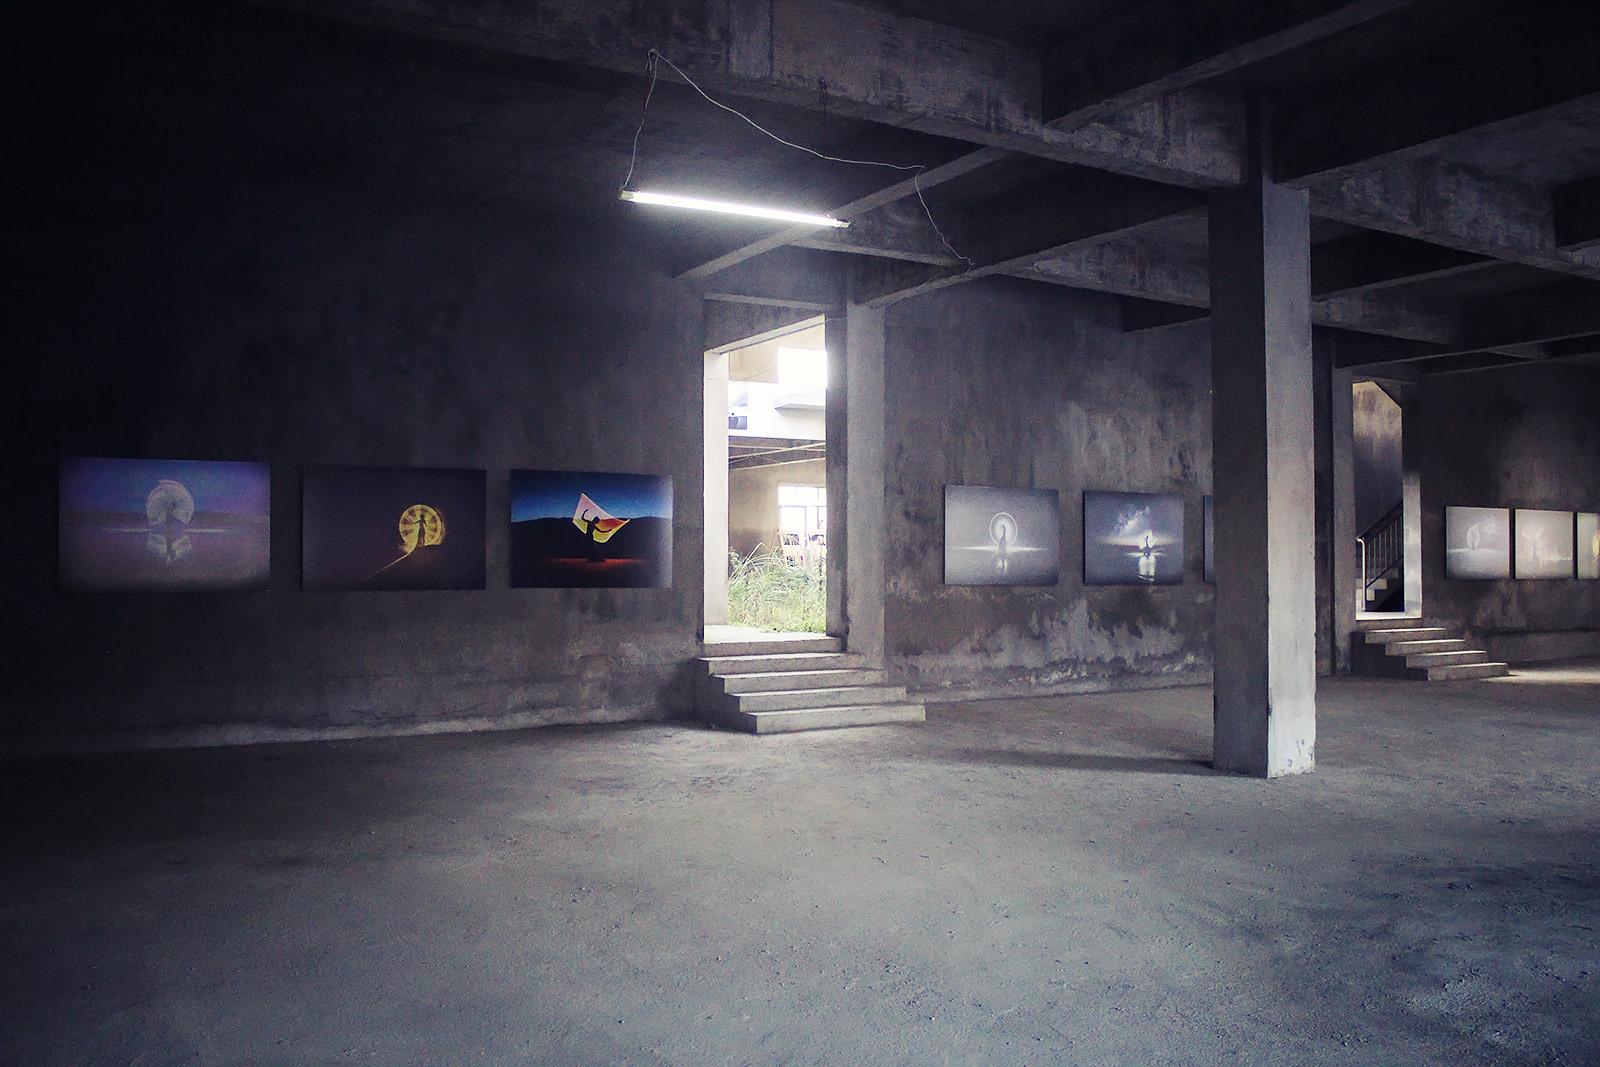 light-painting-exhibition-china-eric-pare-kim-henry-huangshan-international-photography-festival-11th-yixian-3-jpg-p686.jpg